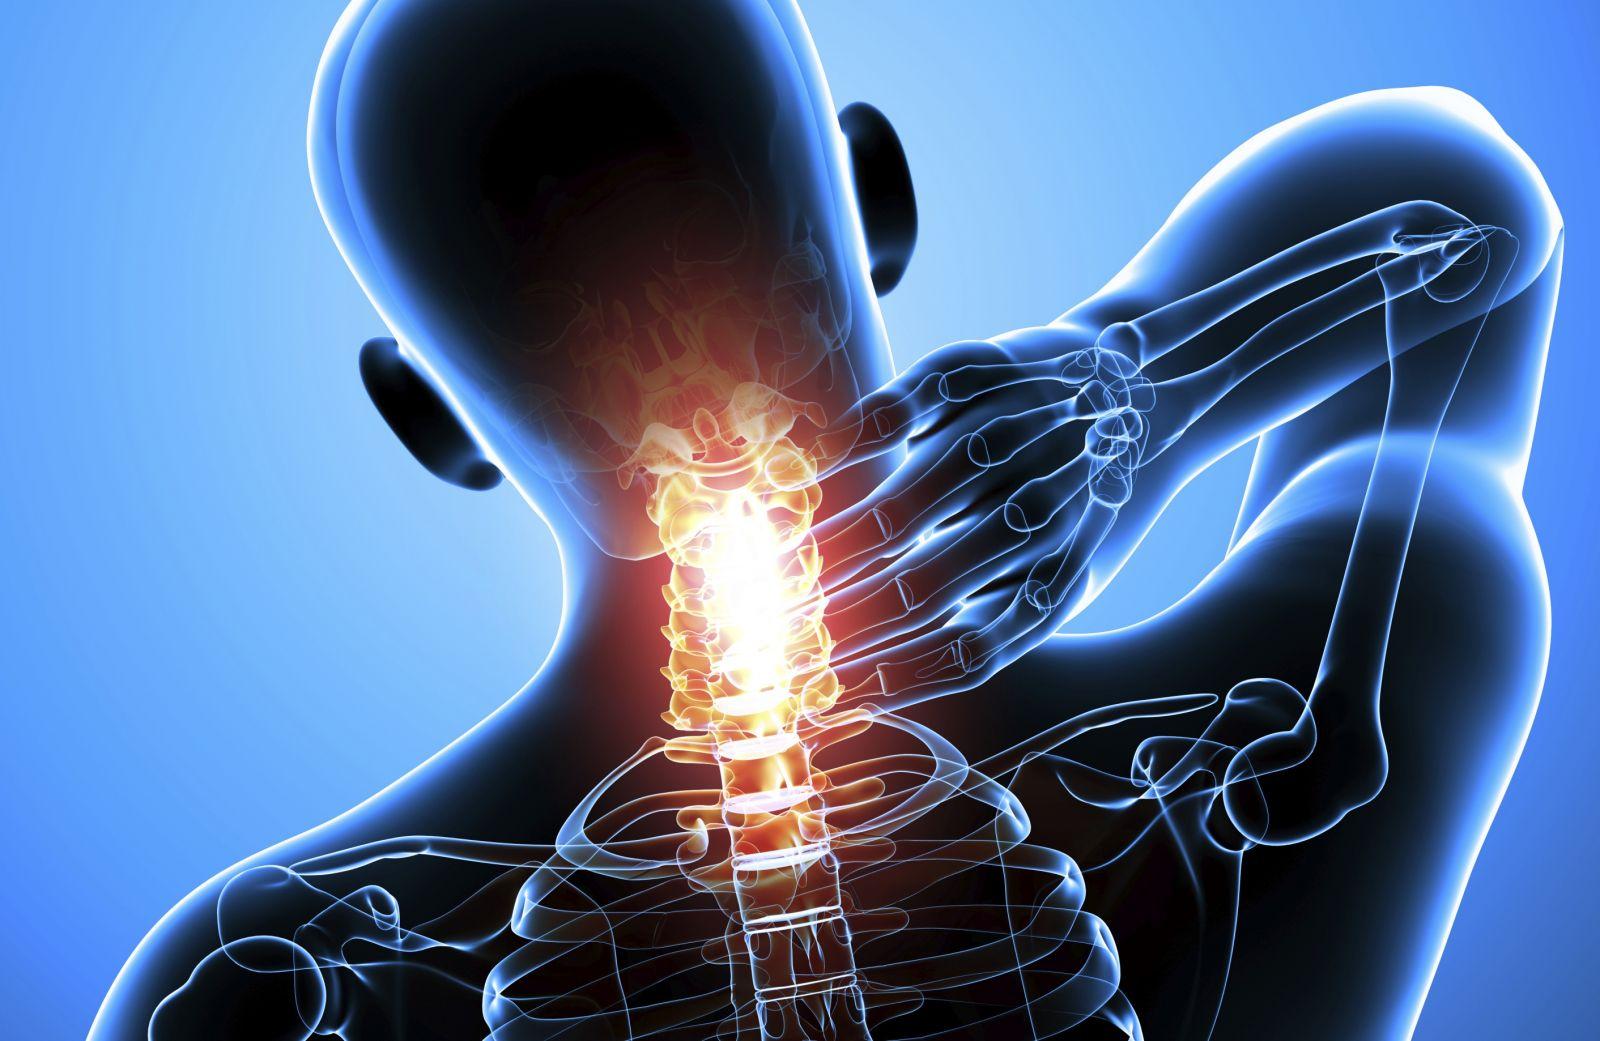 Остеохондроз тазобедренного сустава причины